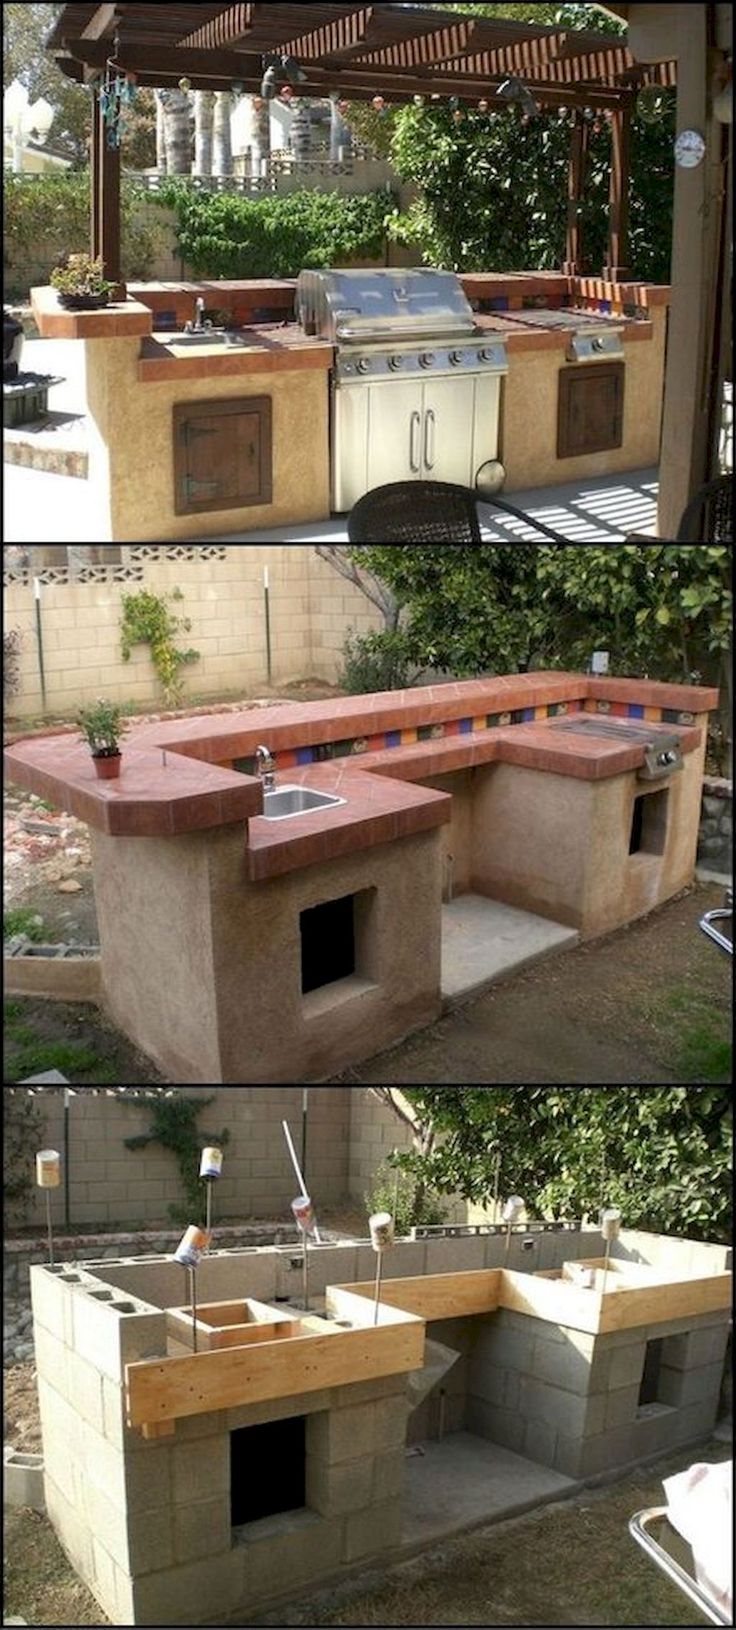 Best 25+ Small outdoor kitchens ideas on Pinterest ...